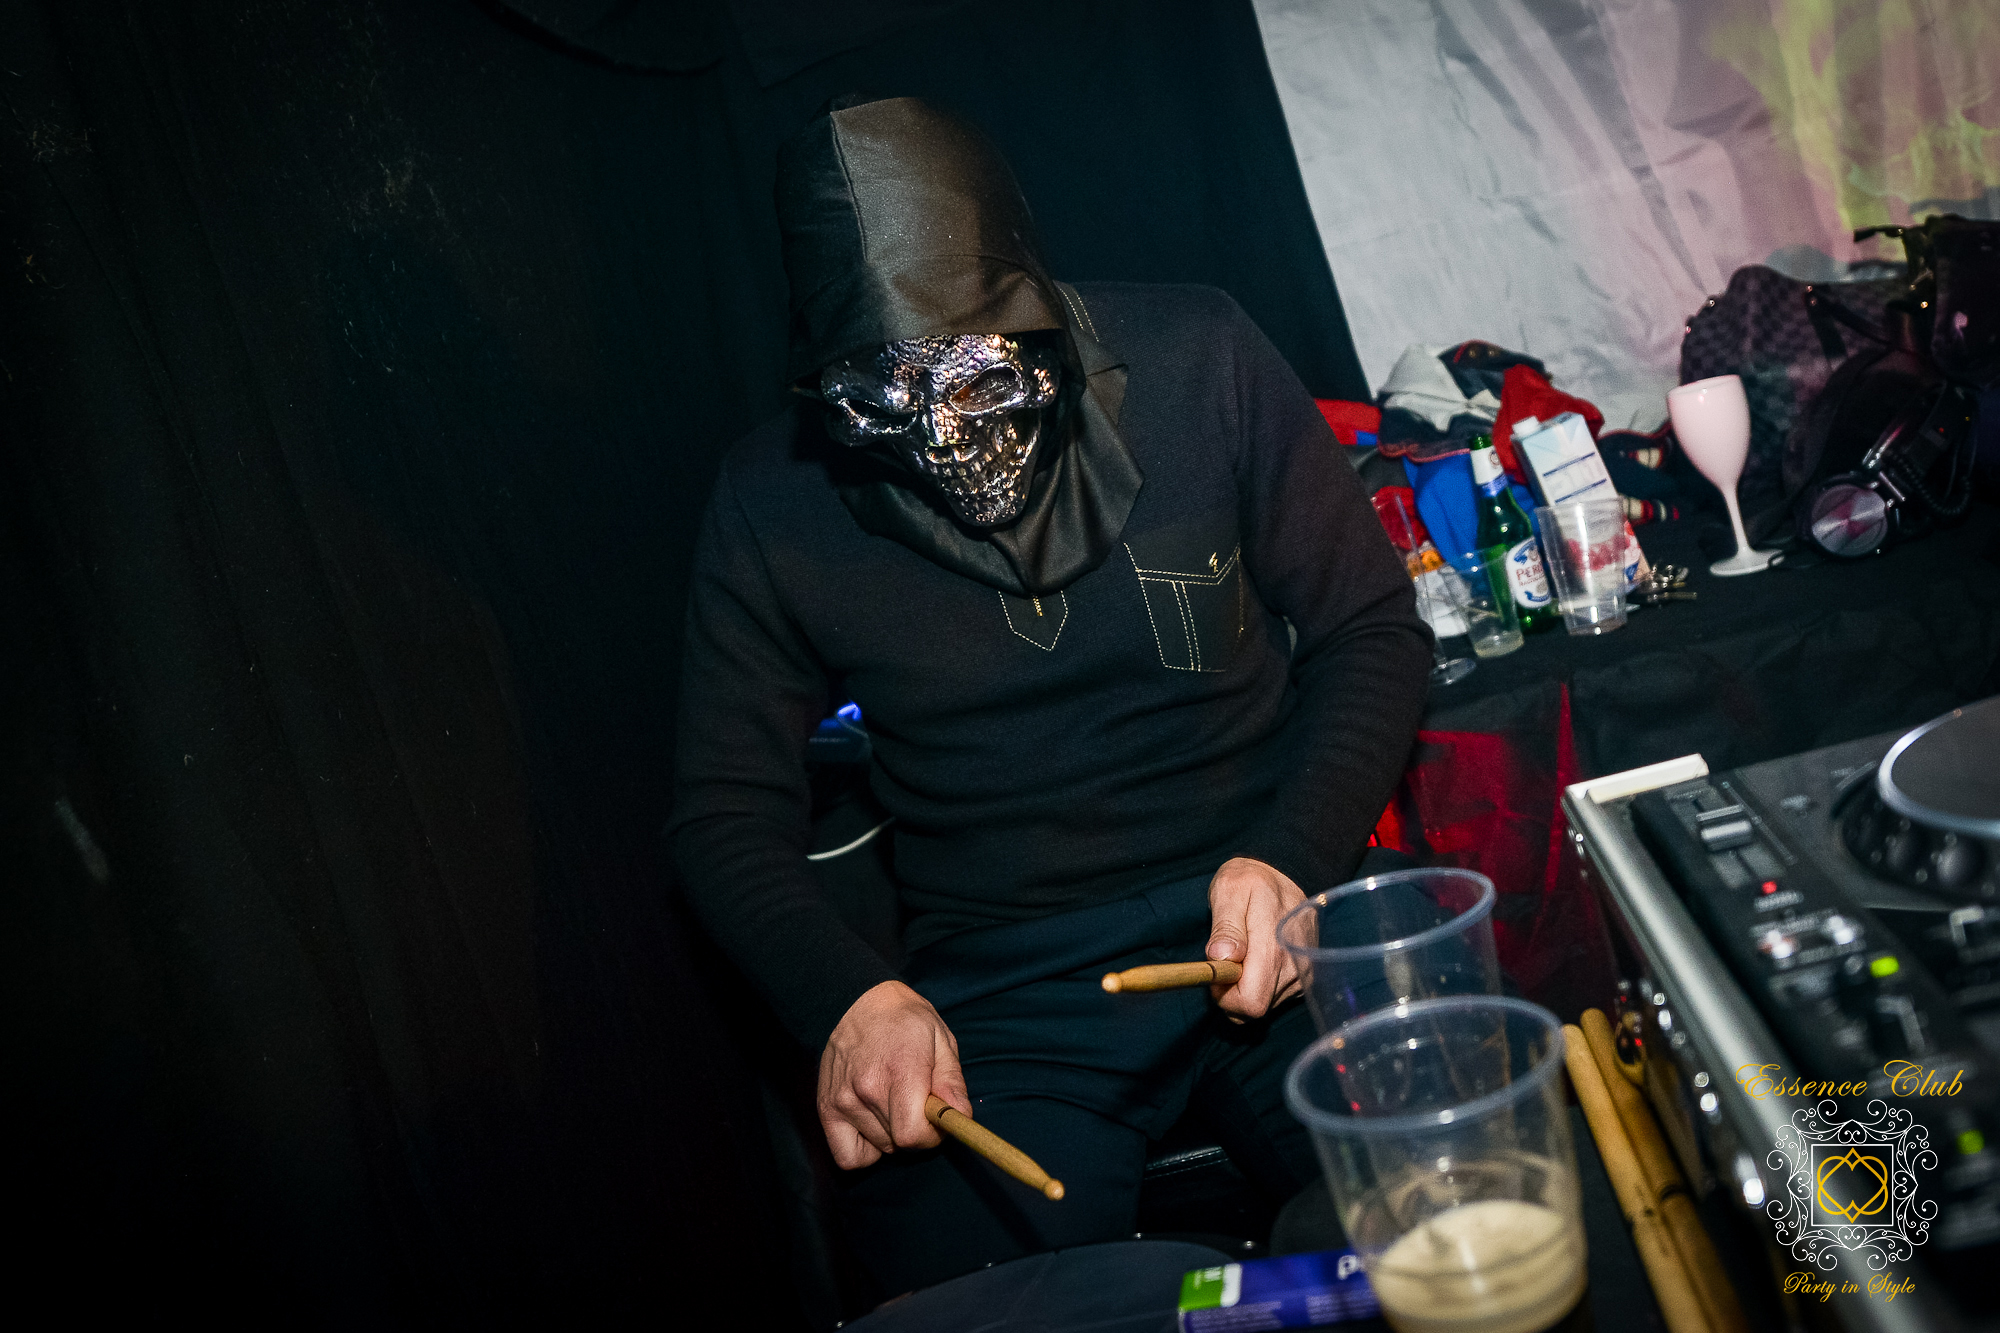 Mike bandoni percussionist